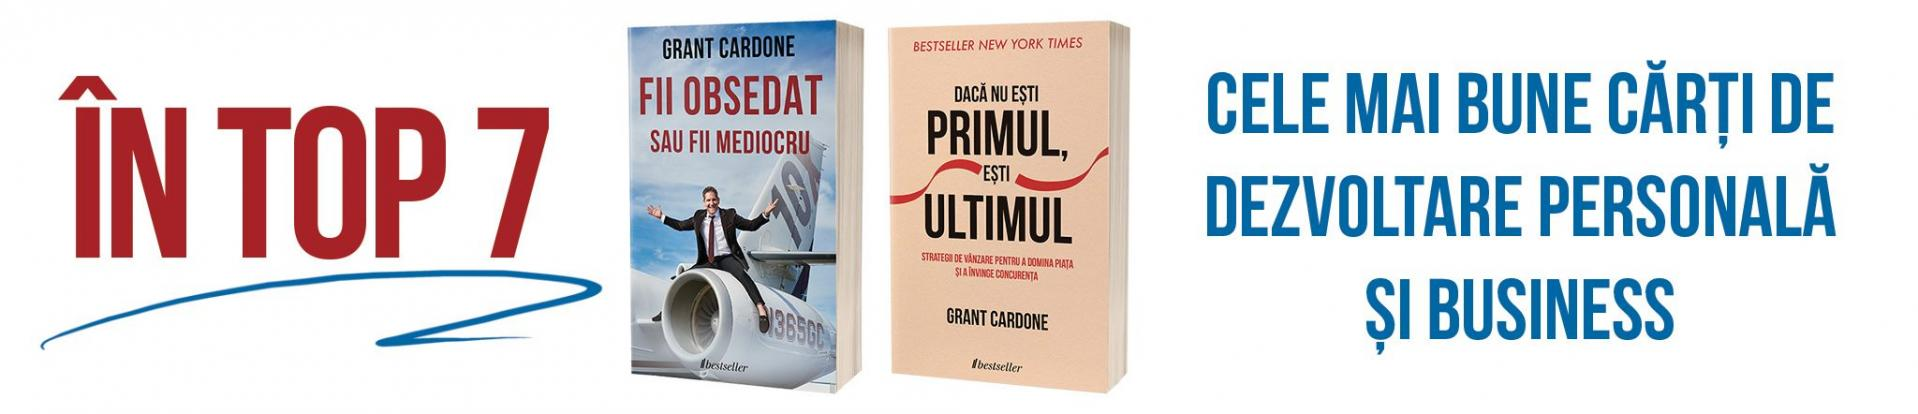 Grant Cardone (Desktop)